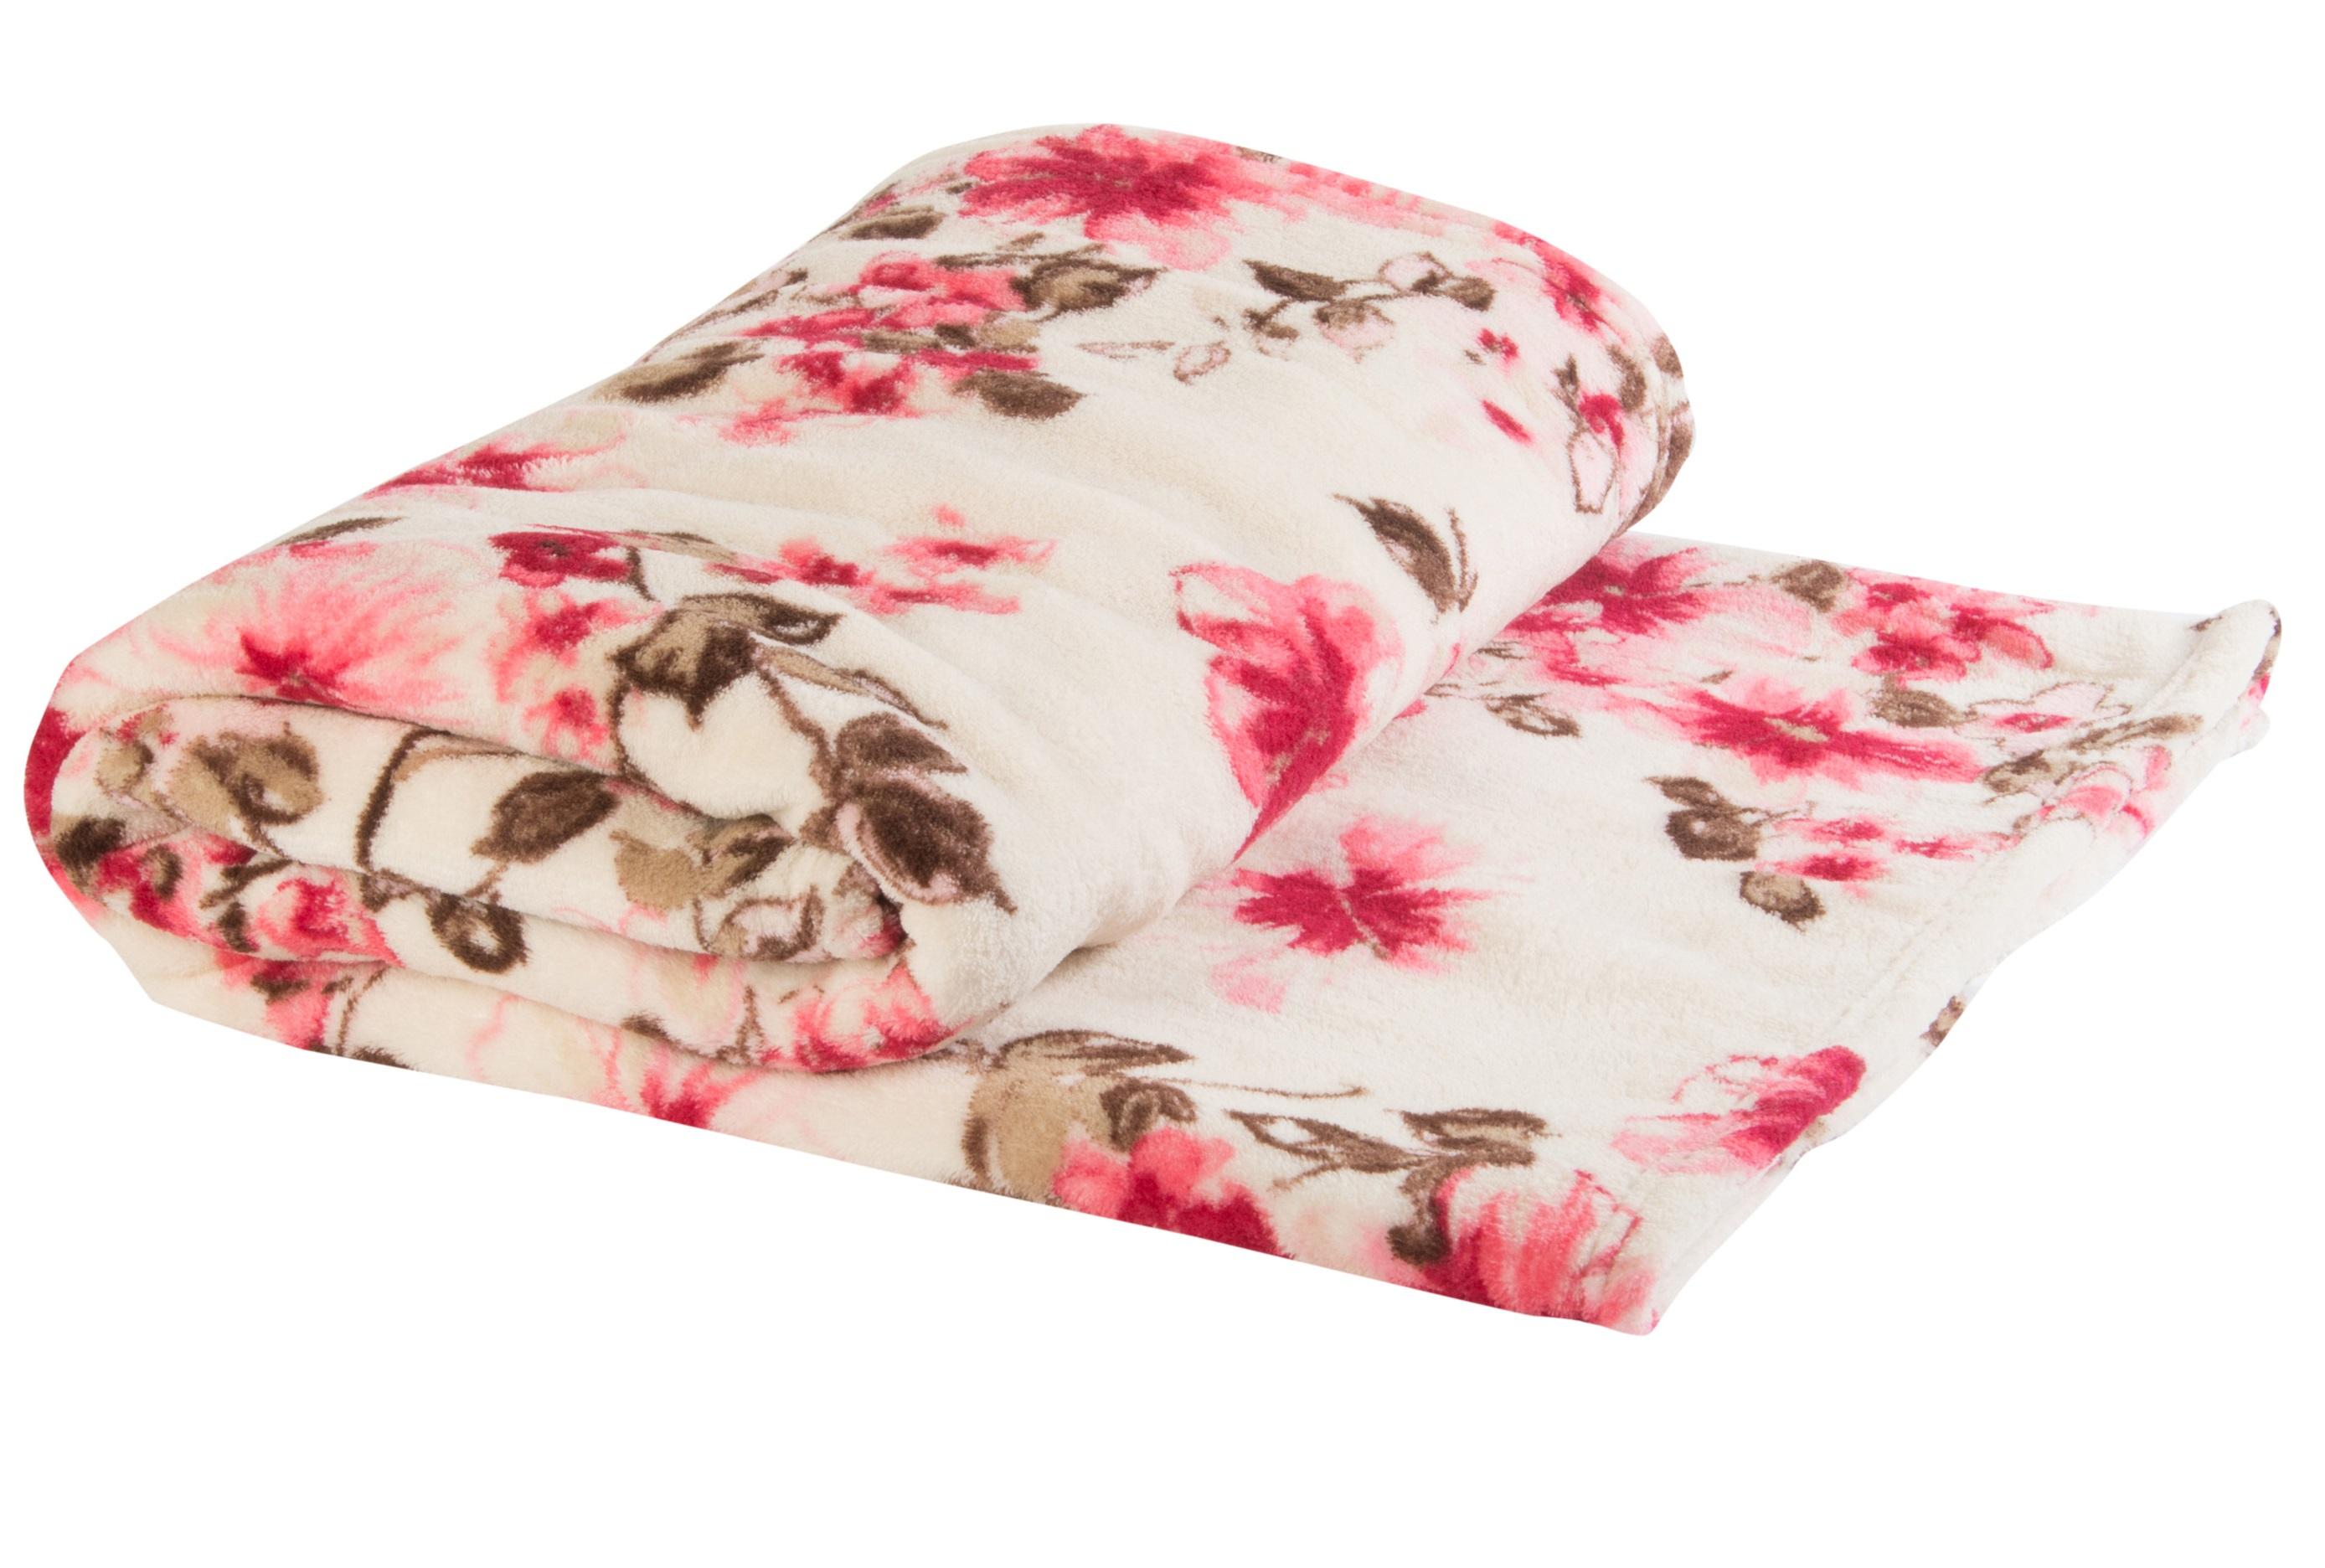 coral fleece blanket throw flower or butterfly luxury sofa bed  - coralfleeceblanketthrowflowerorbutterflyluxury